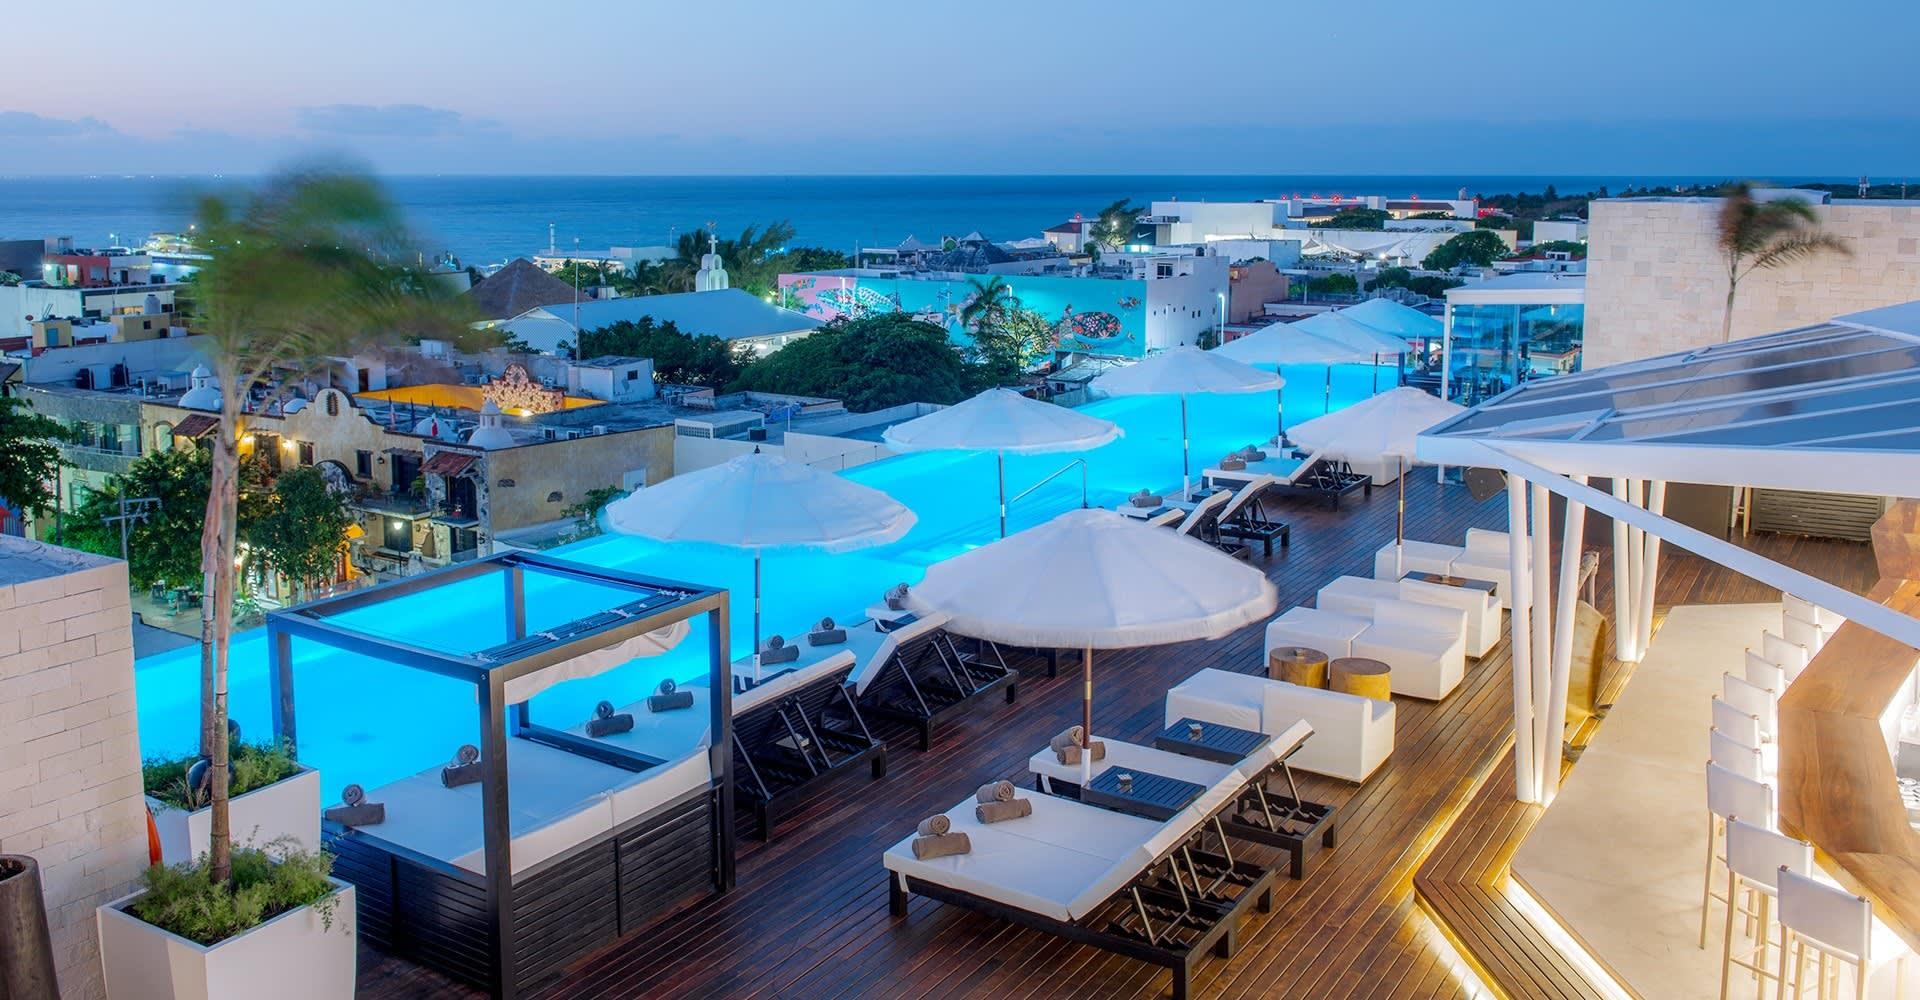 The Five Downtown, Playa del Carmen Dining Facilities